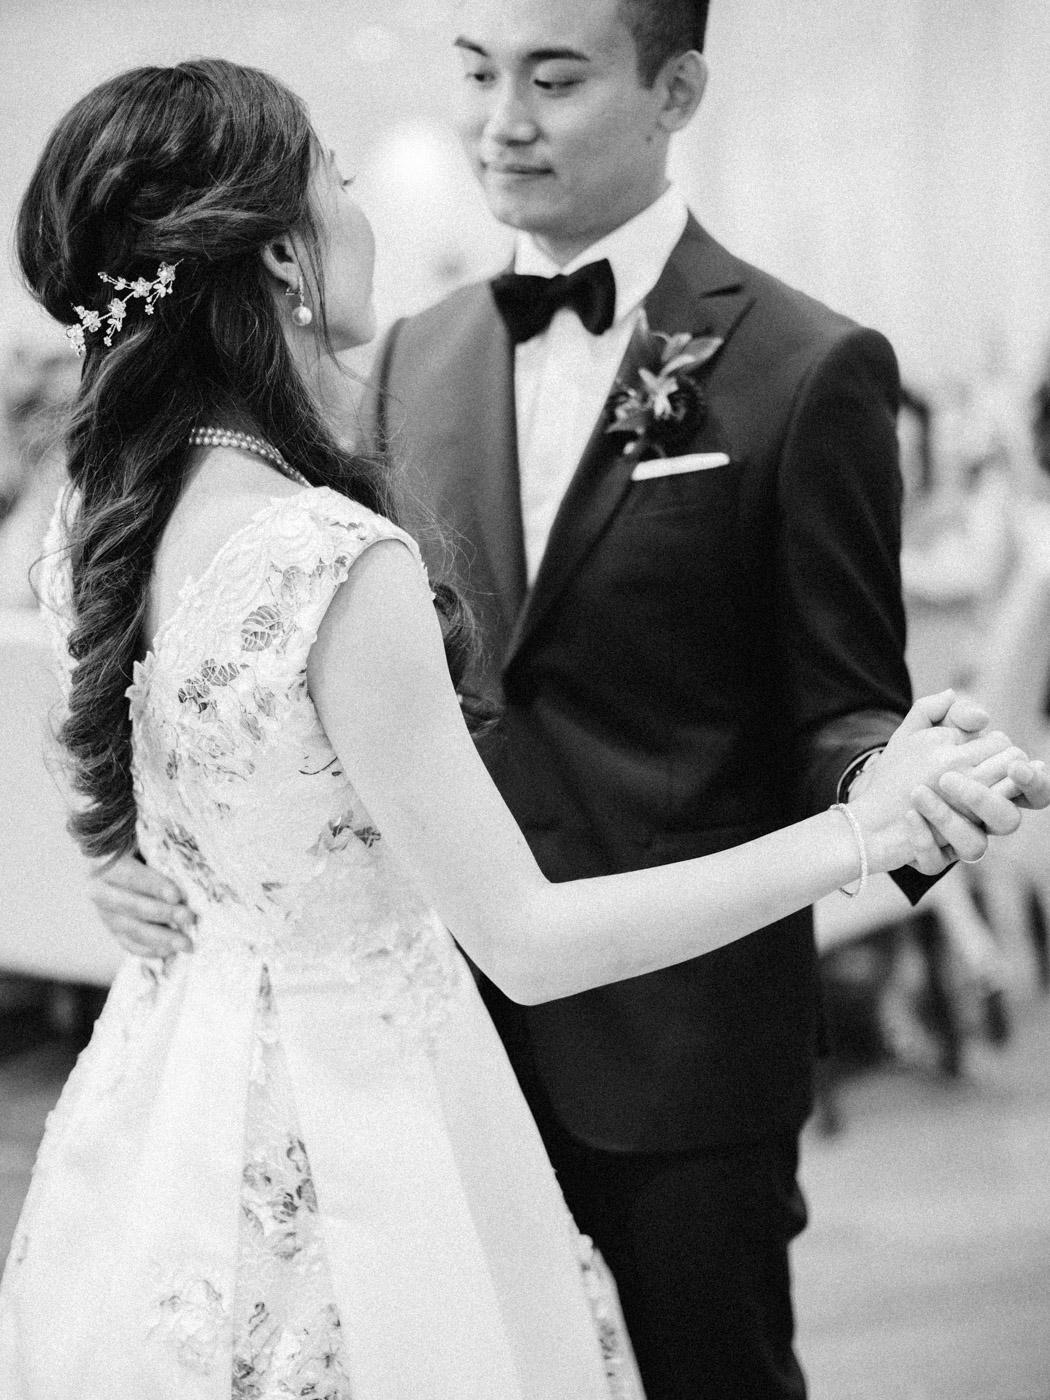 toronto_wedding_photographer_documentary_fine_art_photography-73.jpg